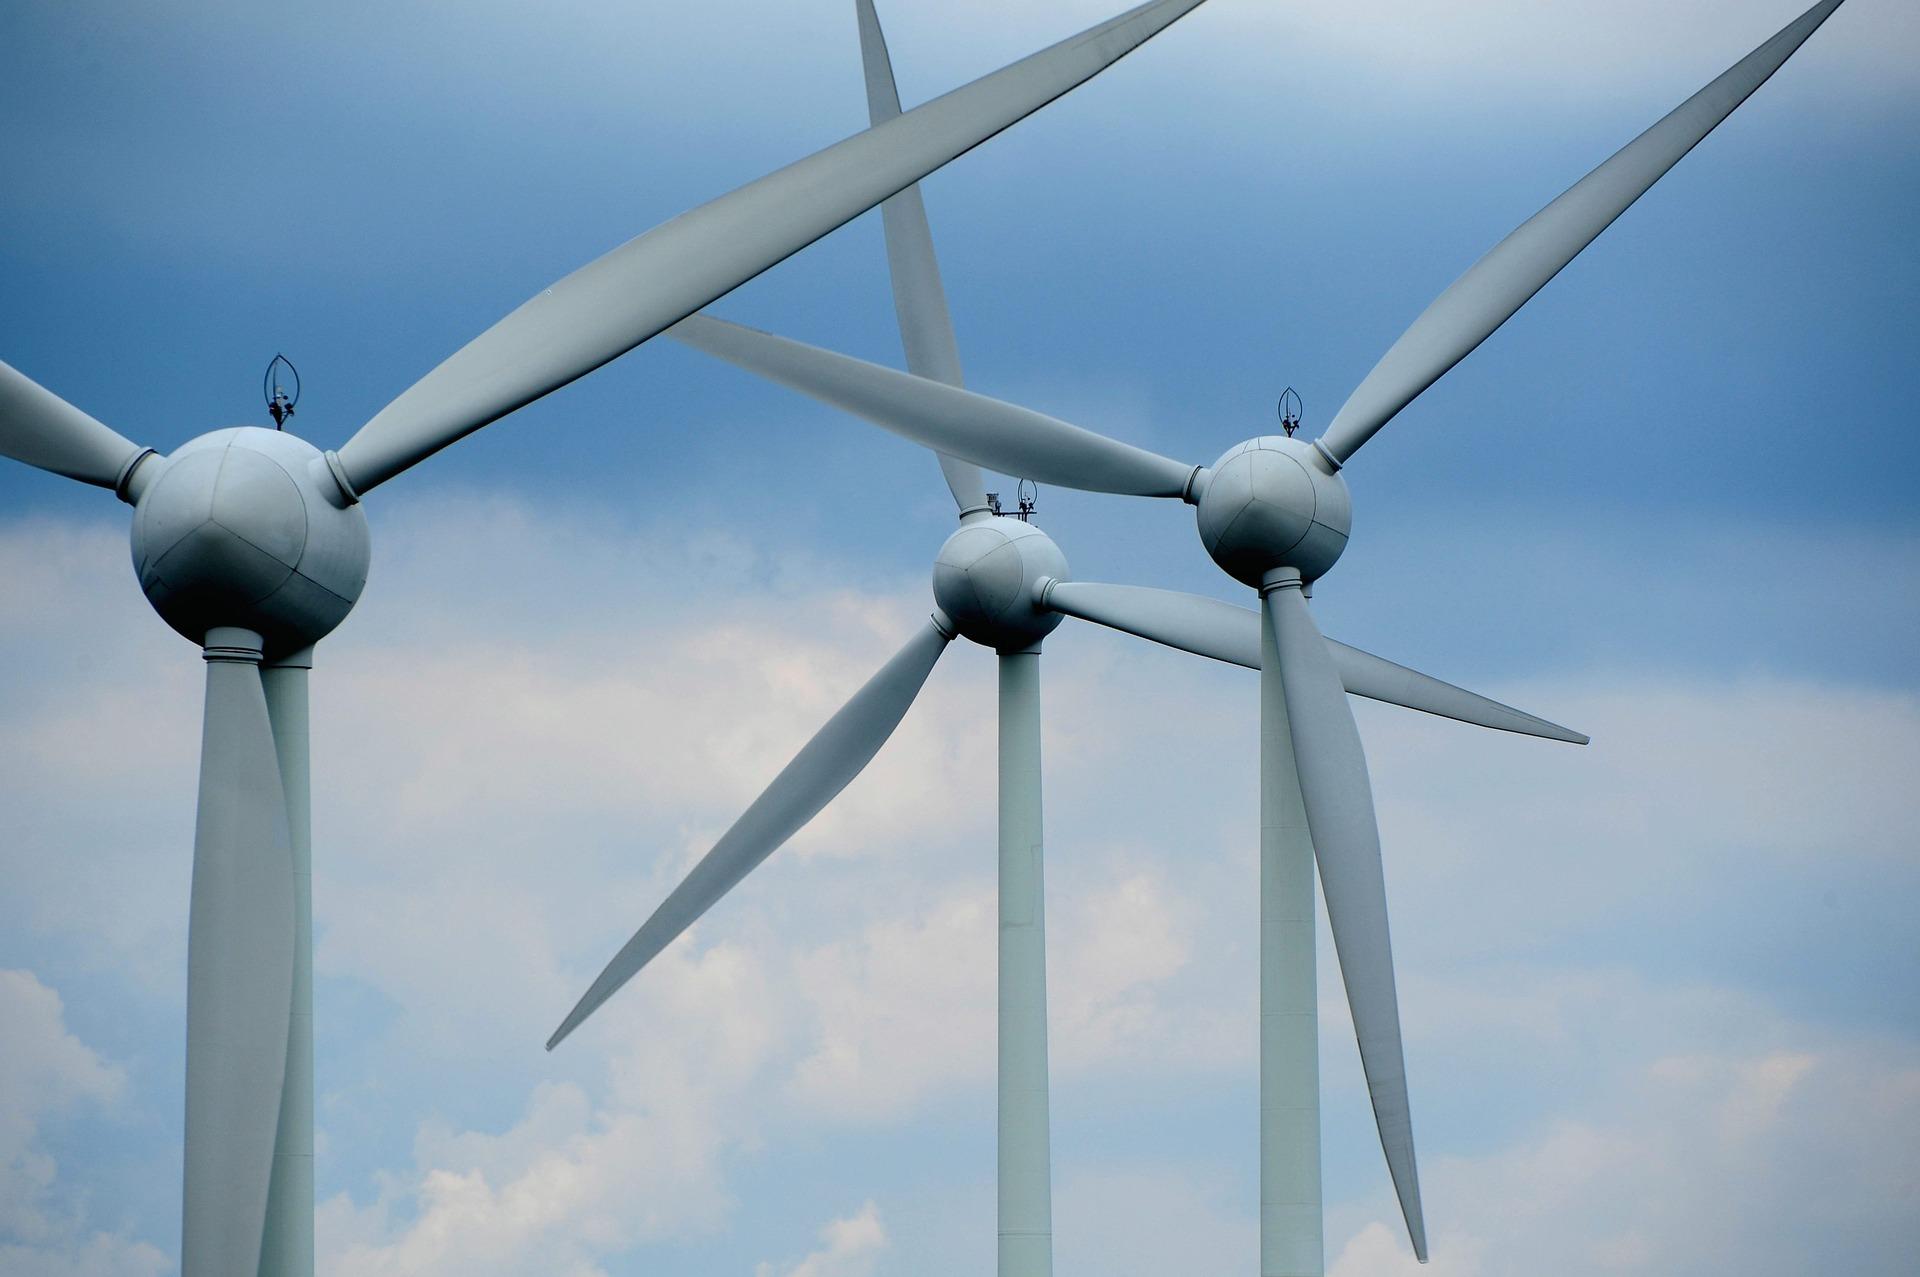 Wind Turbine Coating Nz Protective Coating Coating Co Nz